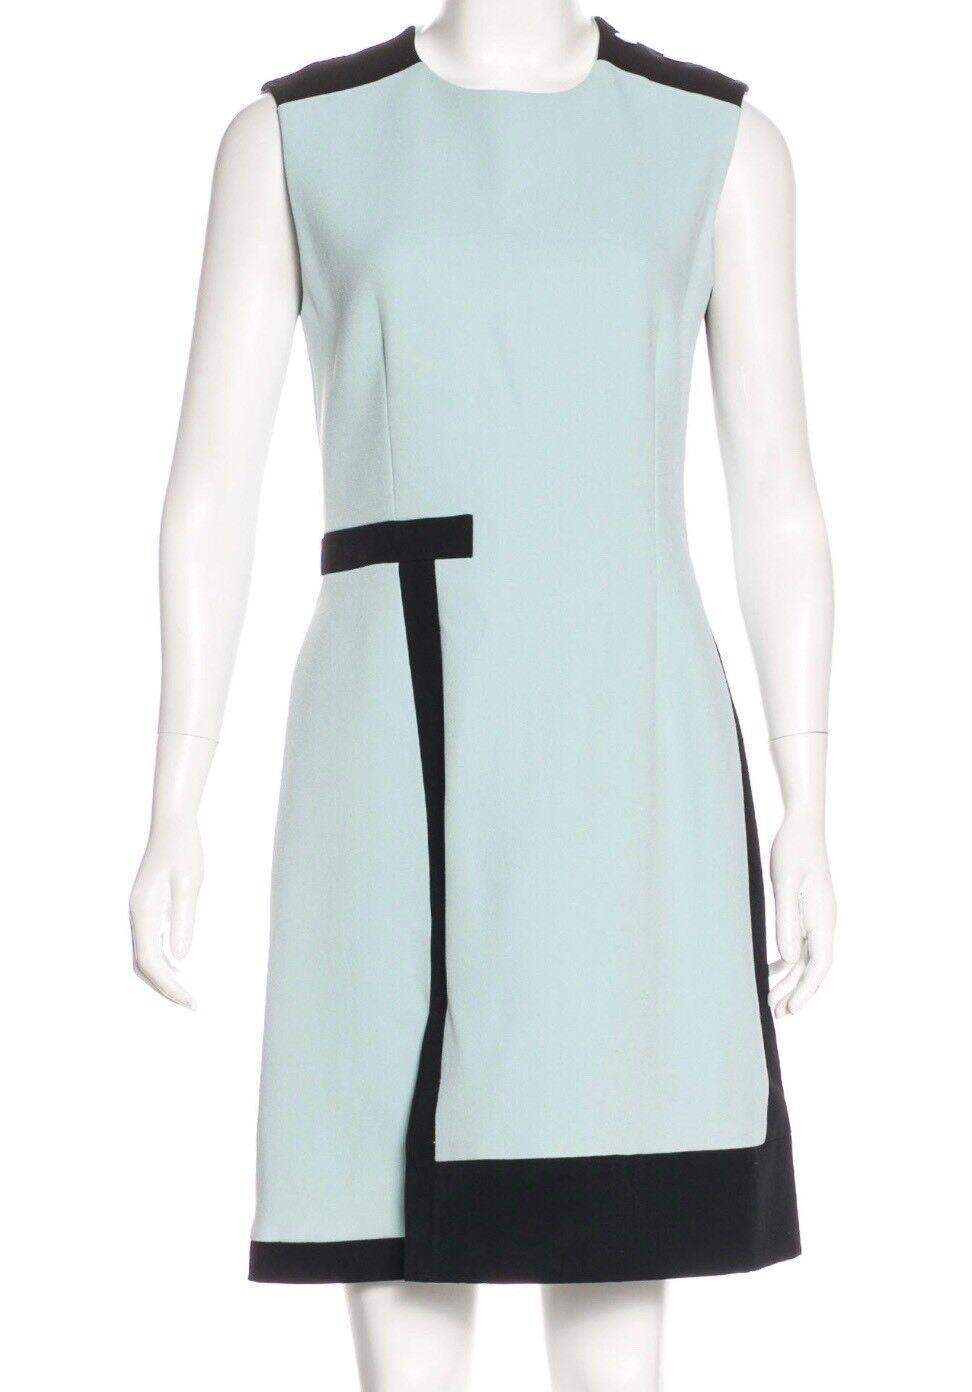 Balenciaga Mint Green A-Line Dress